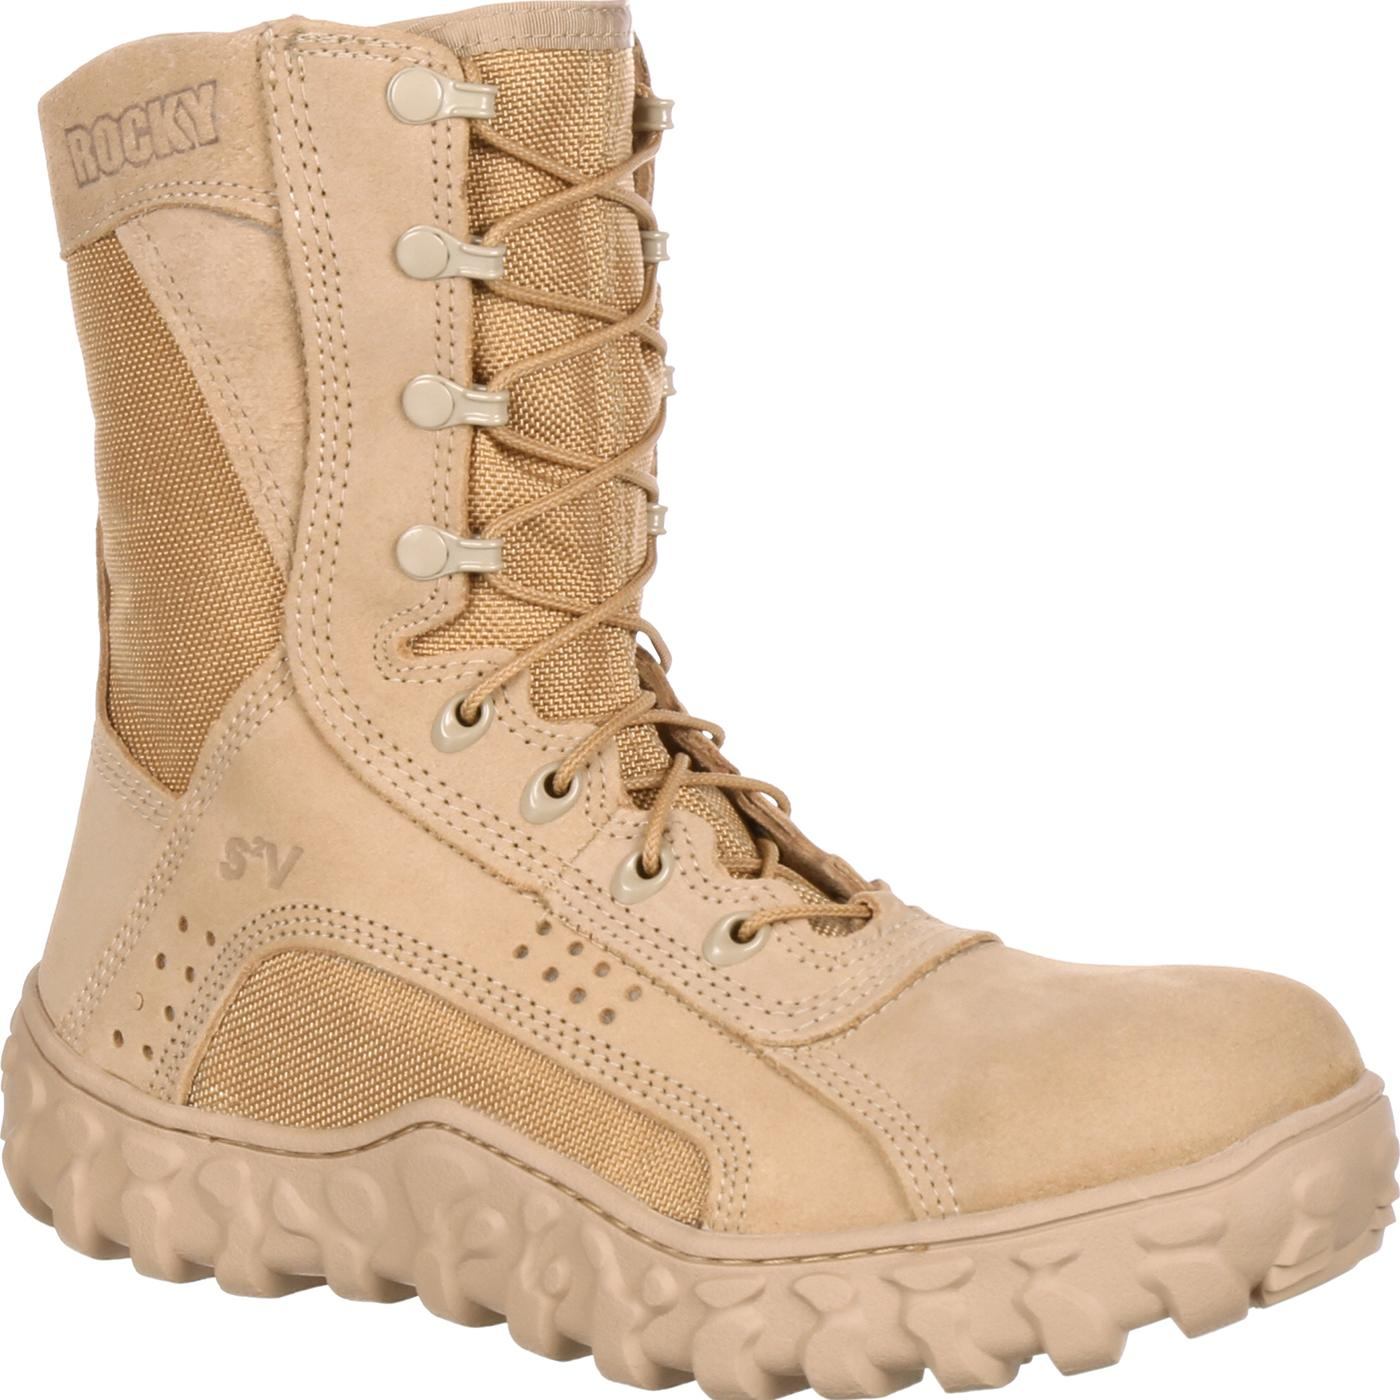 8ea658e7dabf Rocky S2V Steel Toe Tactical Military Boot